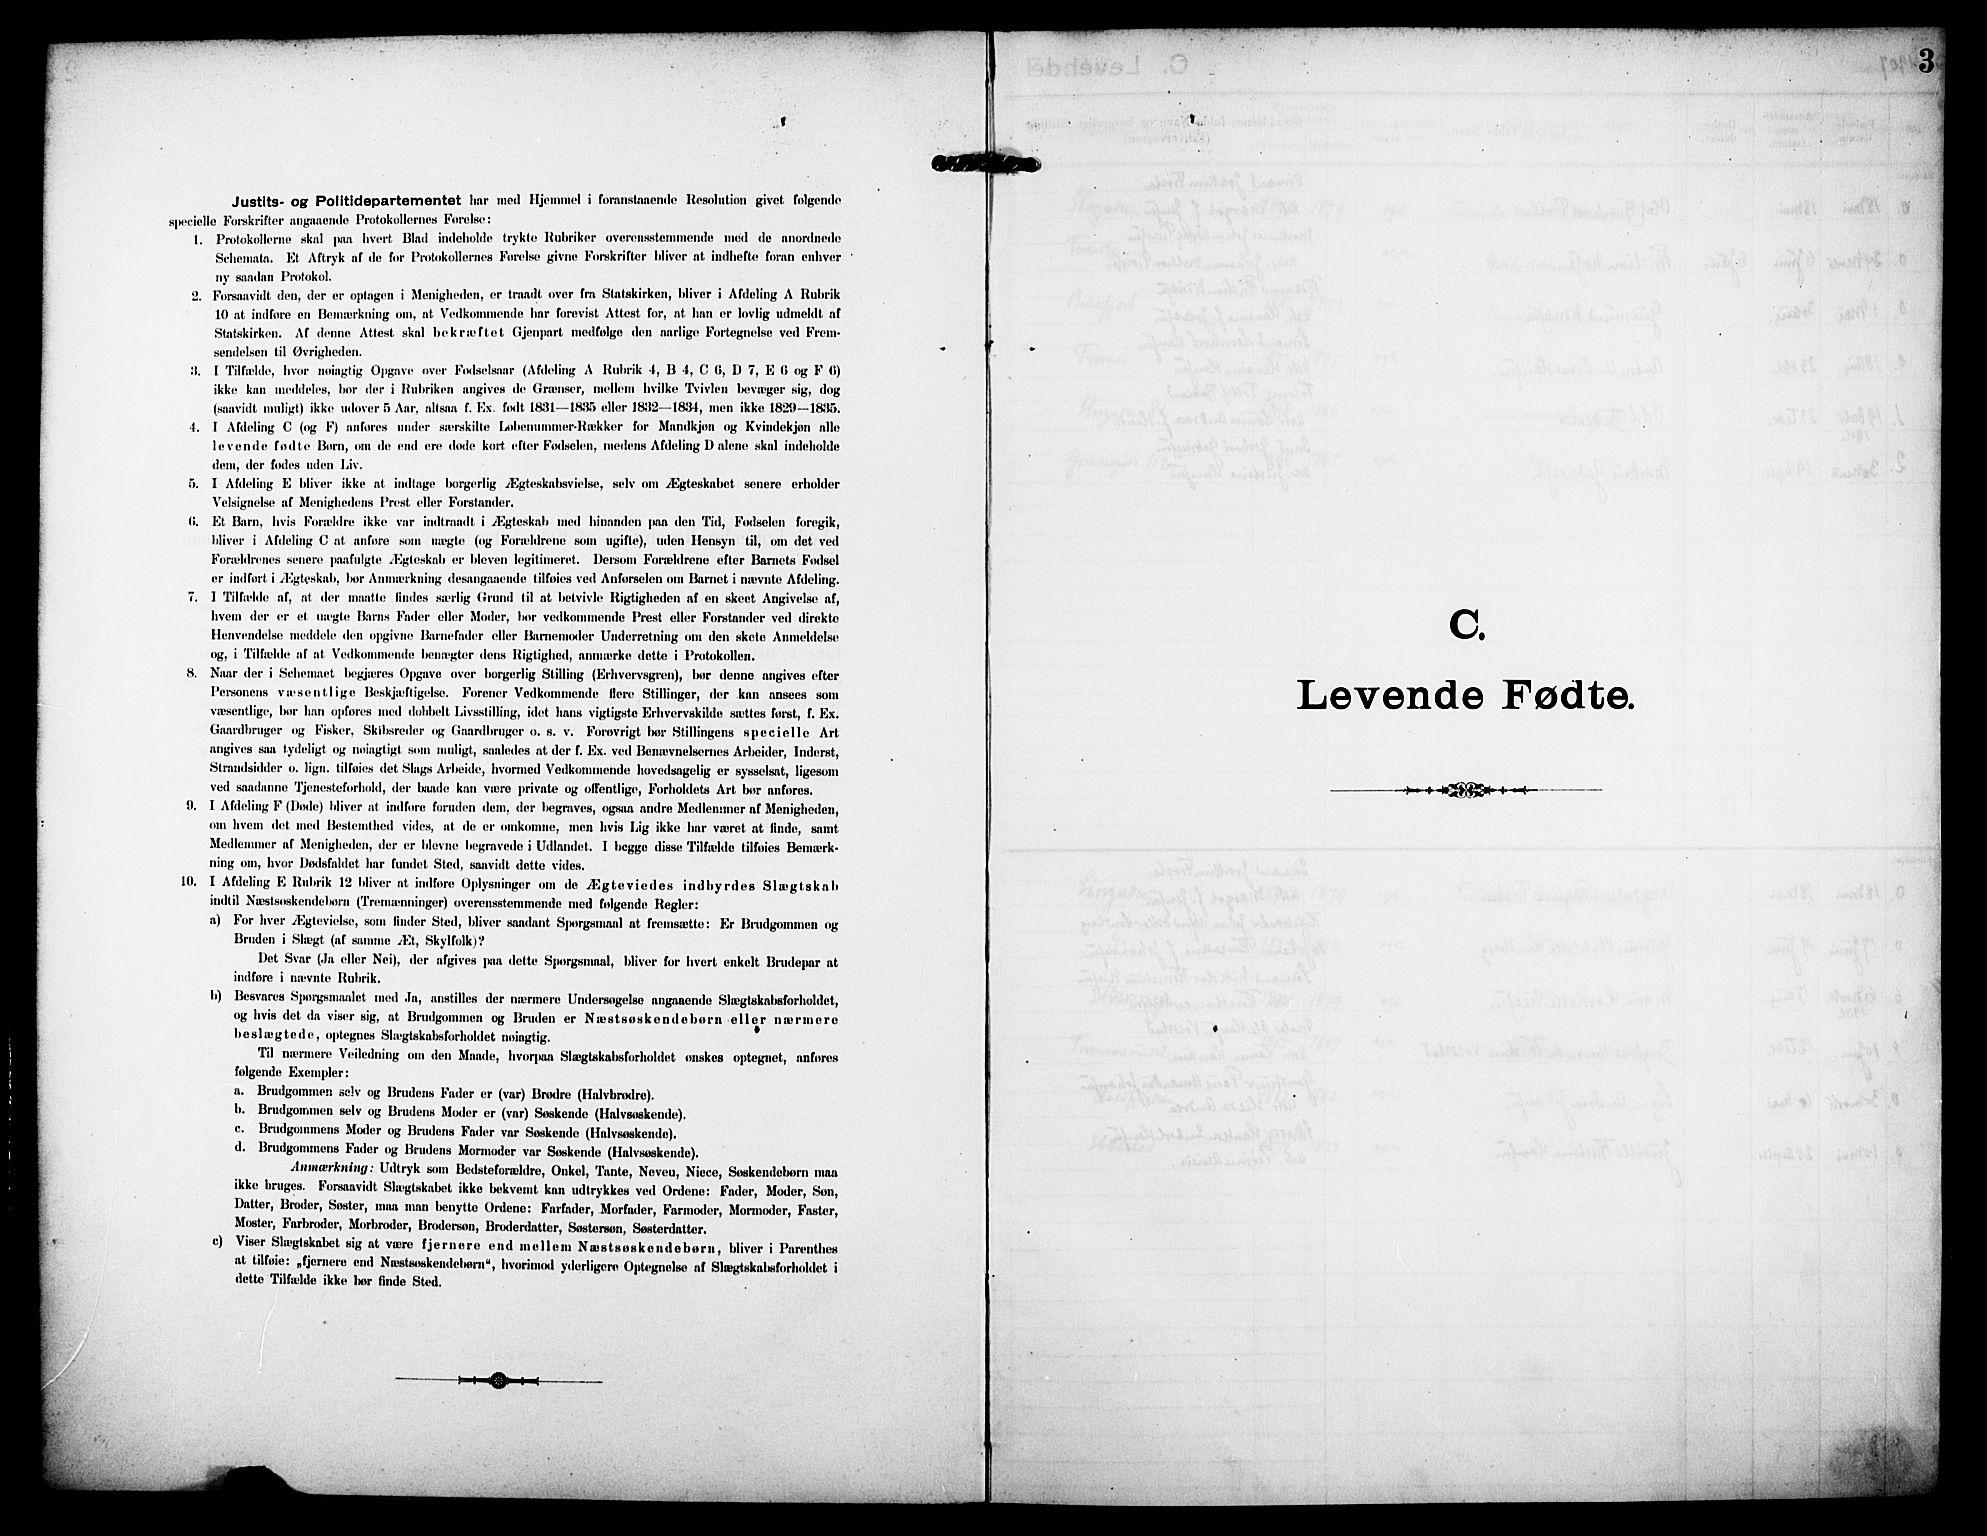 SATØ, Tromsø sokneprestkontor/stiftsprosti/domprosti, G/Ge/L0068: Dissenterprotokoll nr. 68, 1907-1917, s. 3